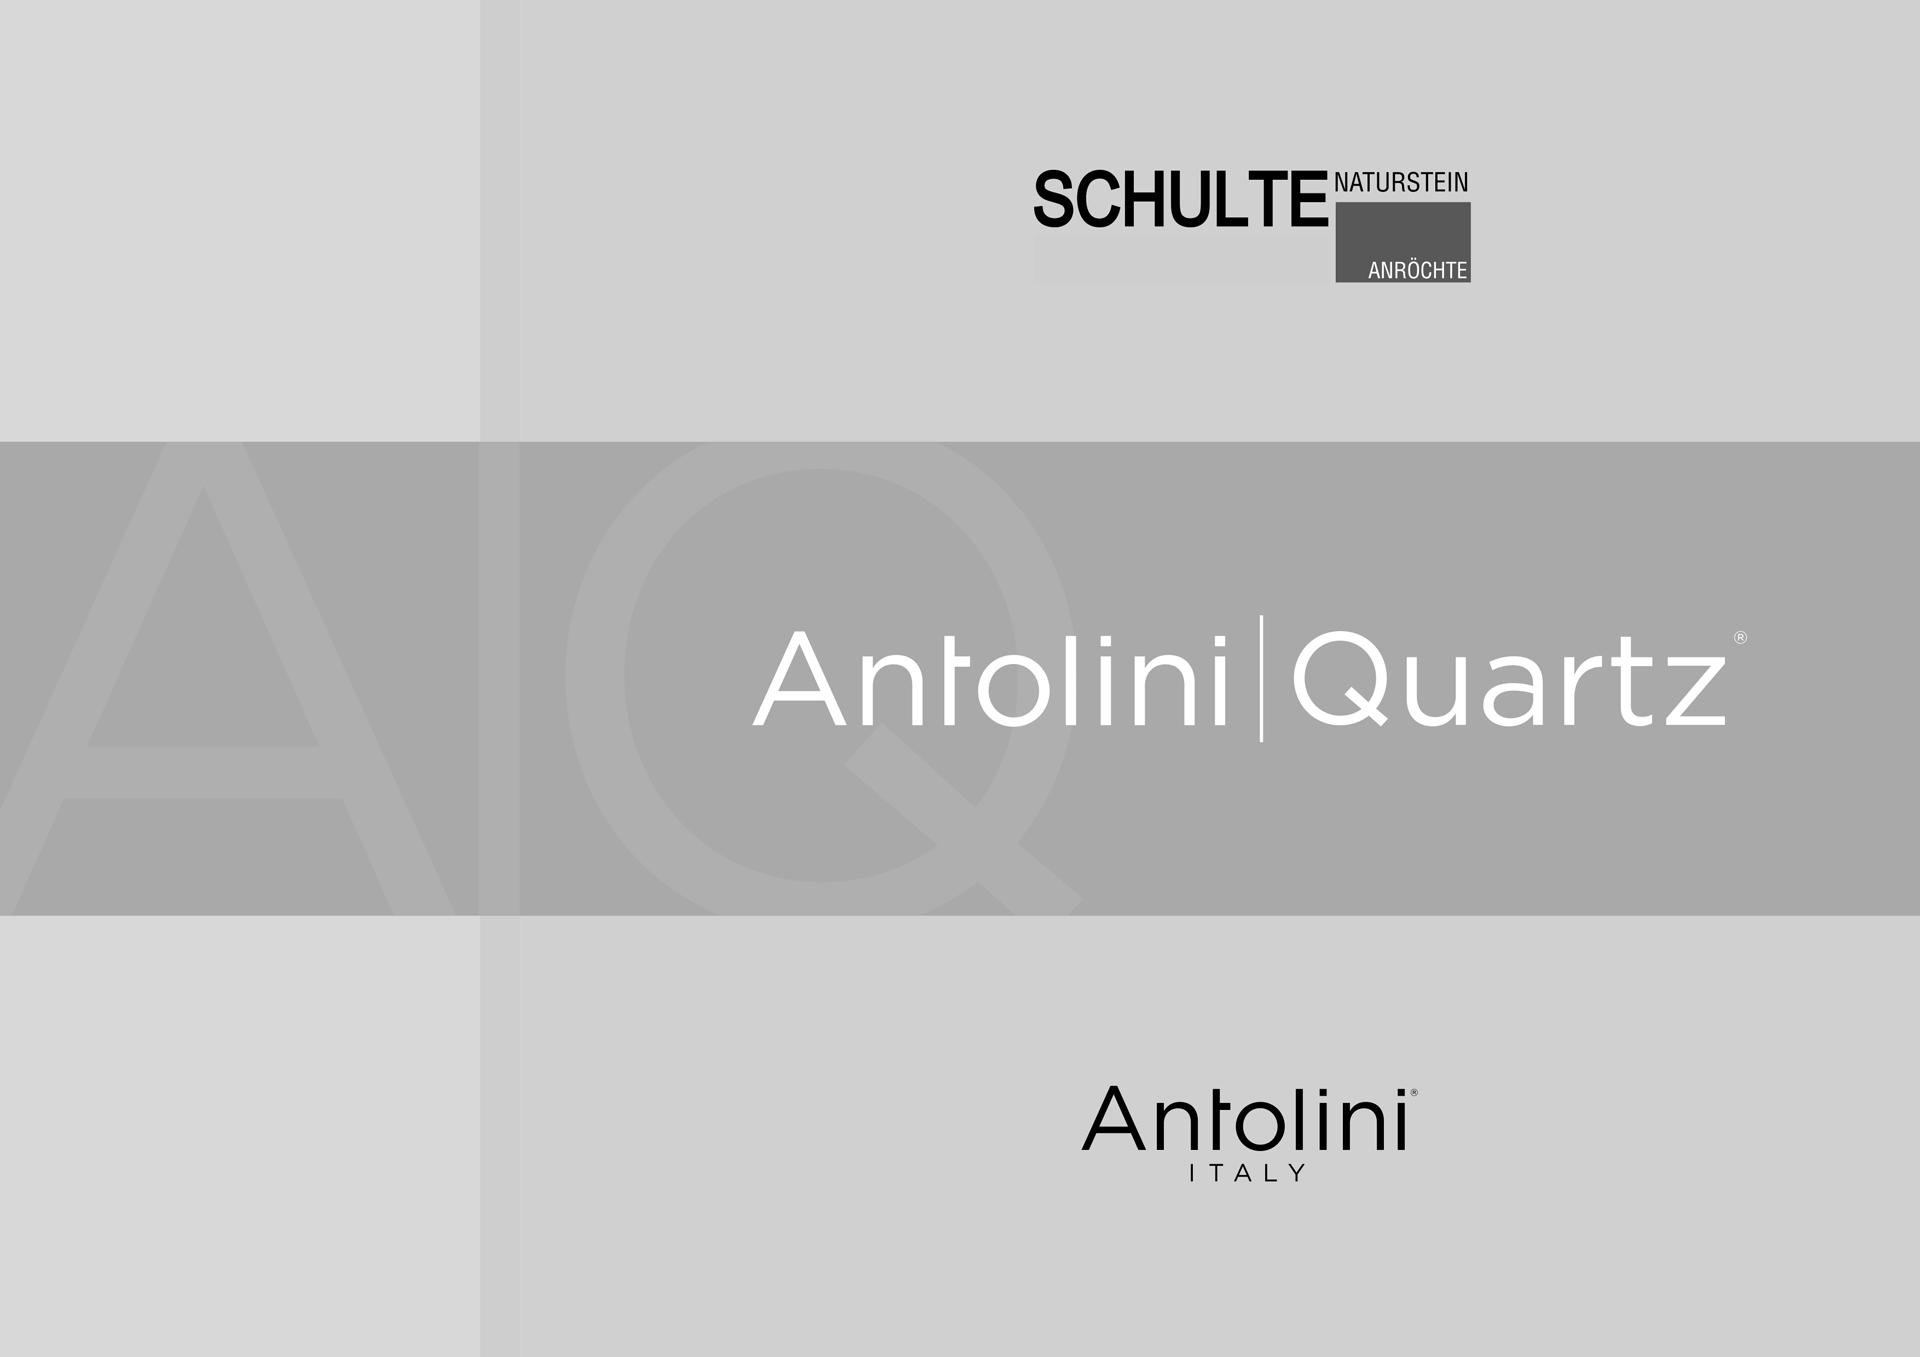 Catalogo Antolini Quartz Schulte 2020 bassa 1